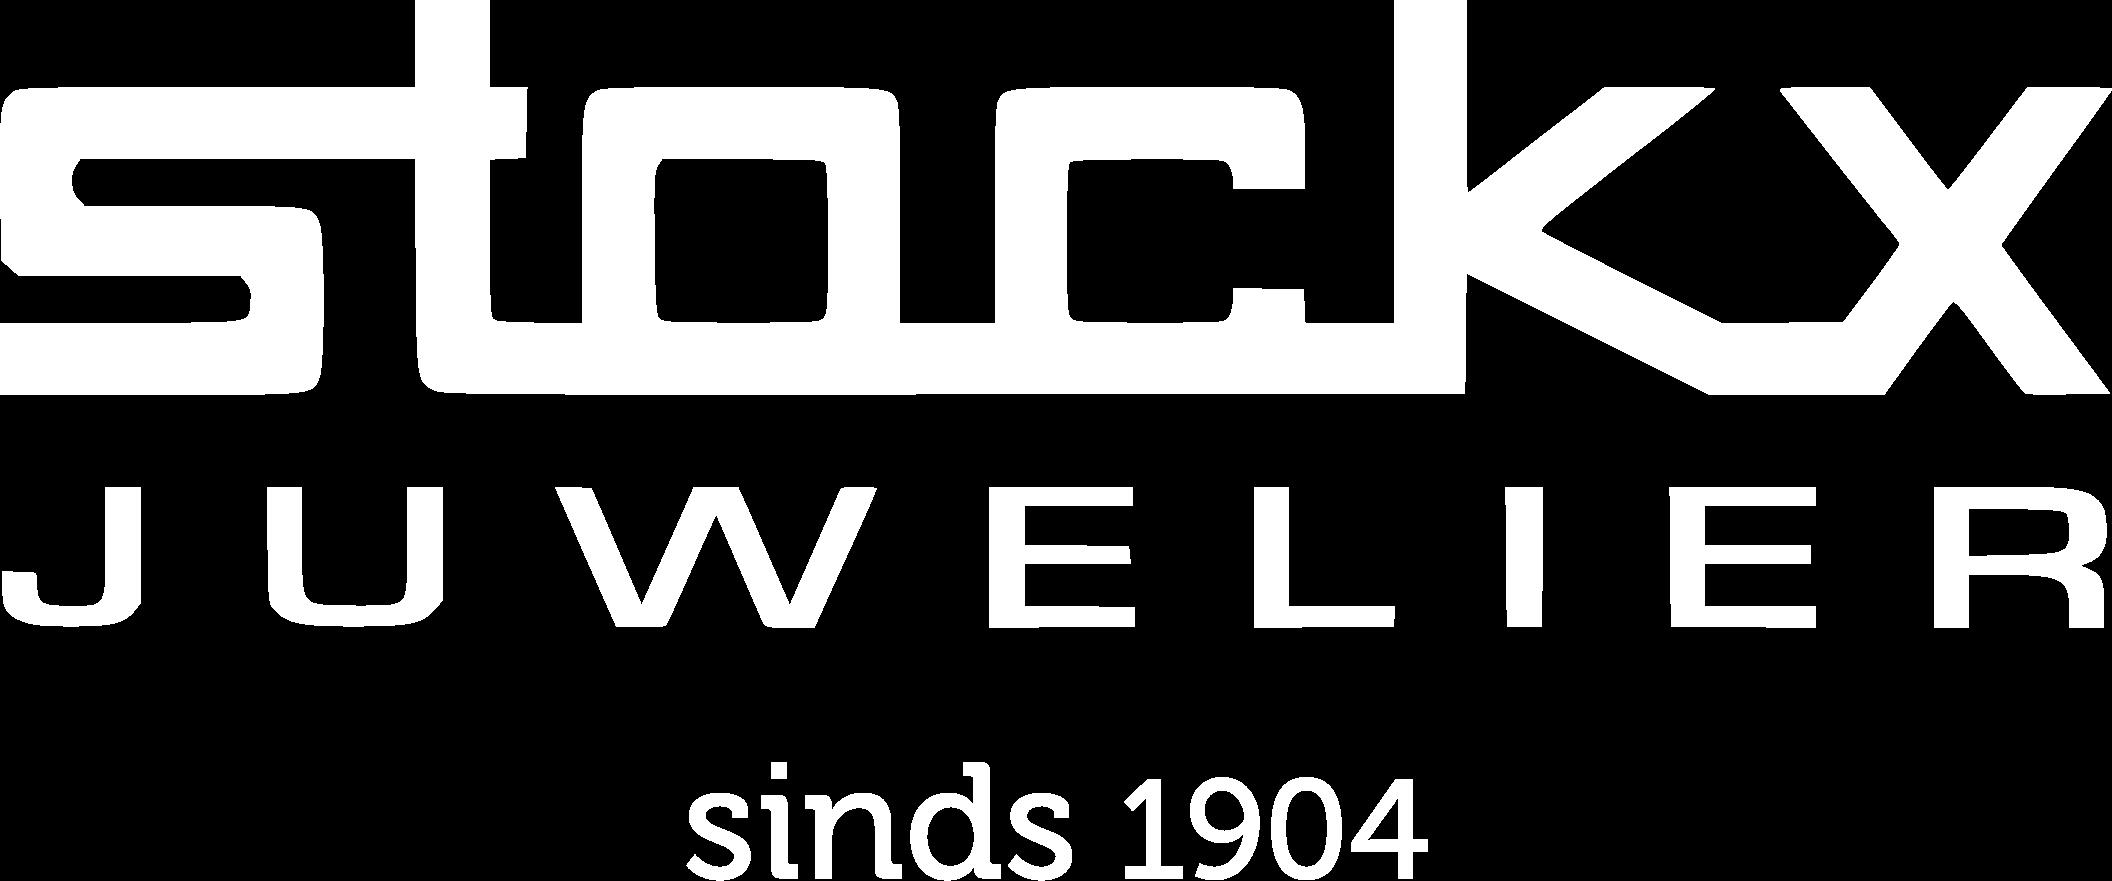 Stockx Juwelier Helmond